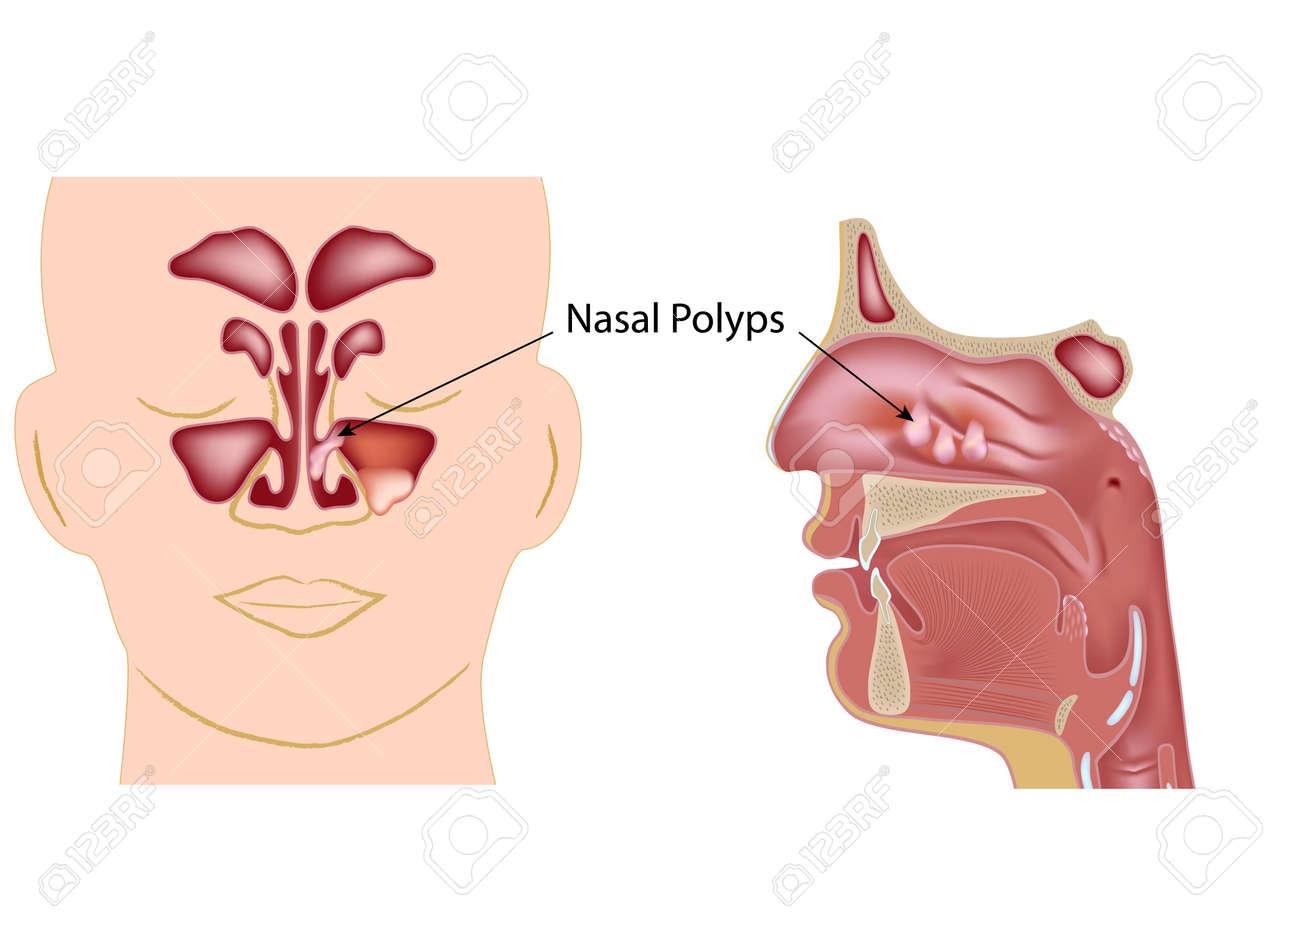 Nasal Polyps Royalty Free Cliparts, Vectors, And Stock Illustration ...